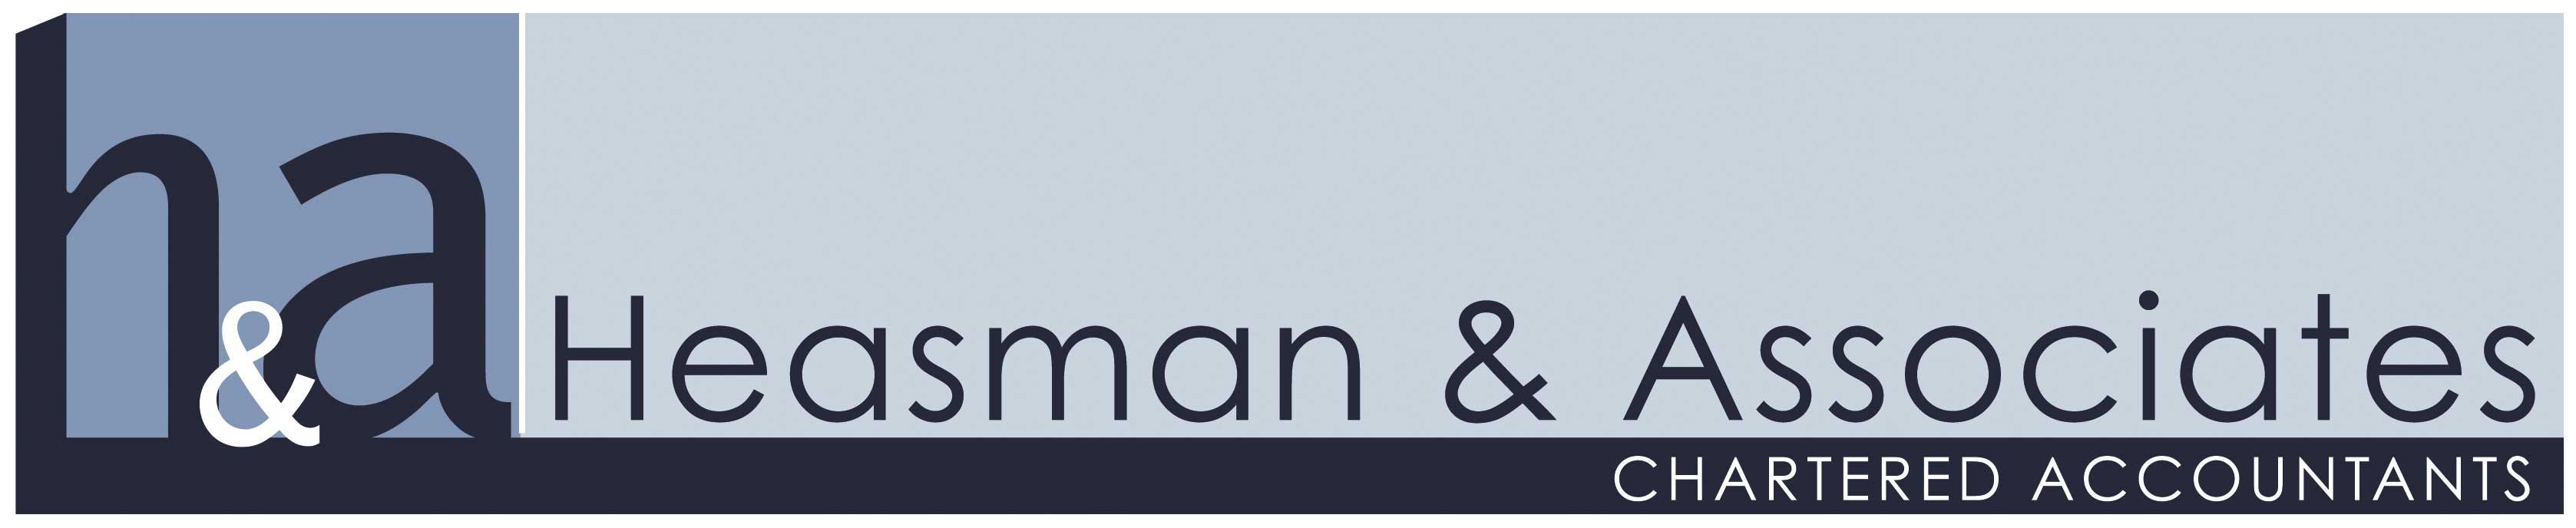 Heasman & Associates logo